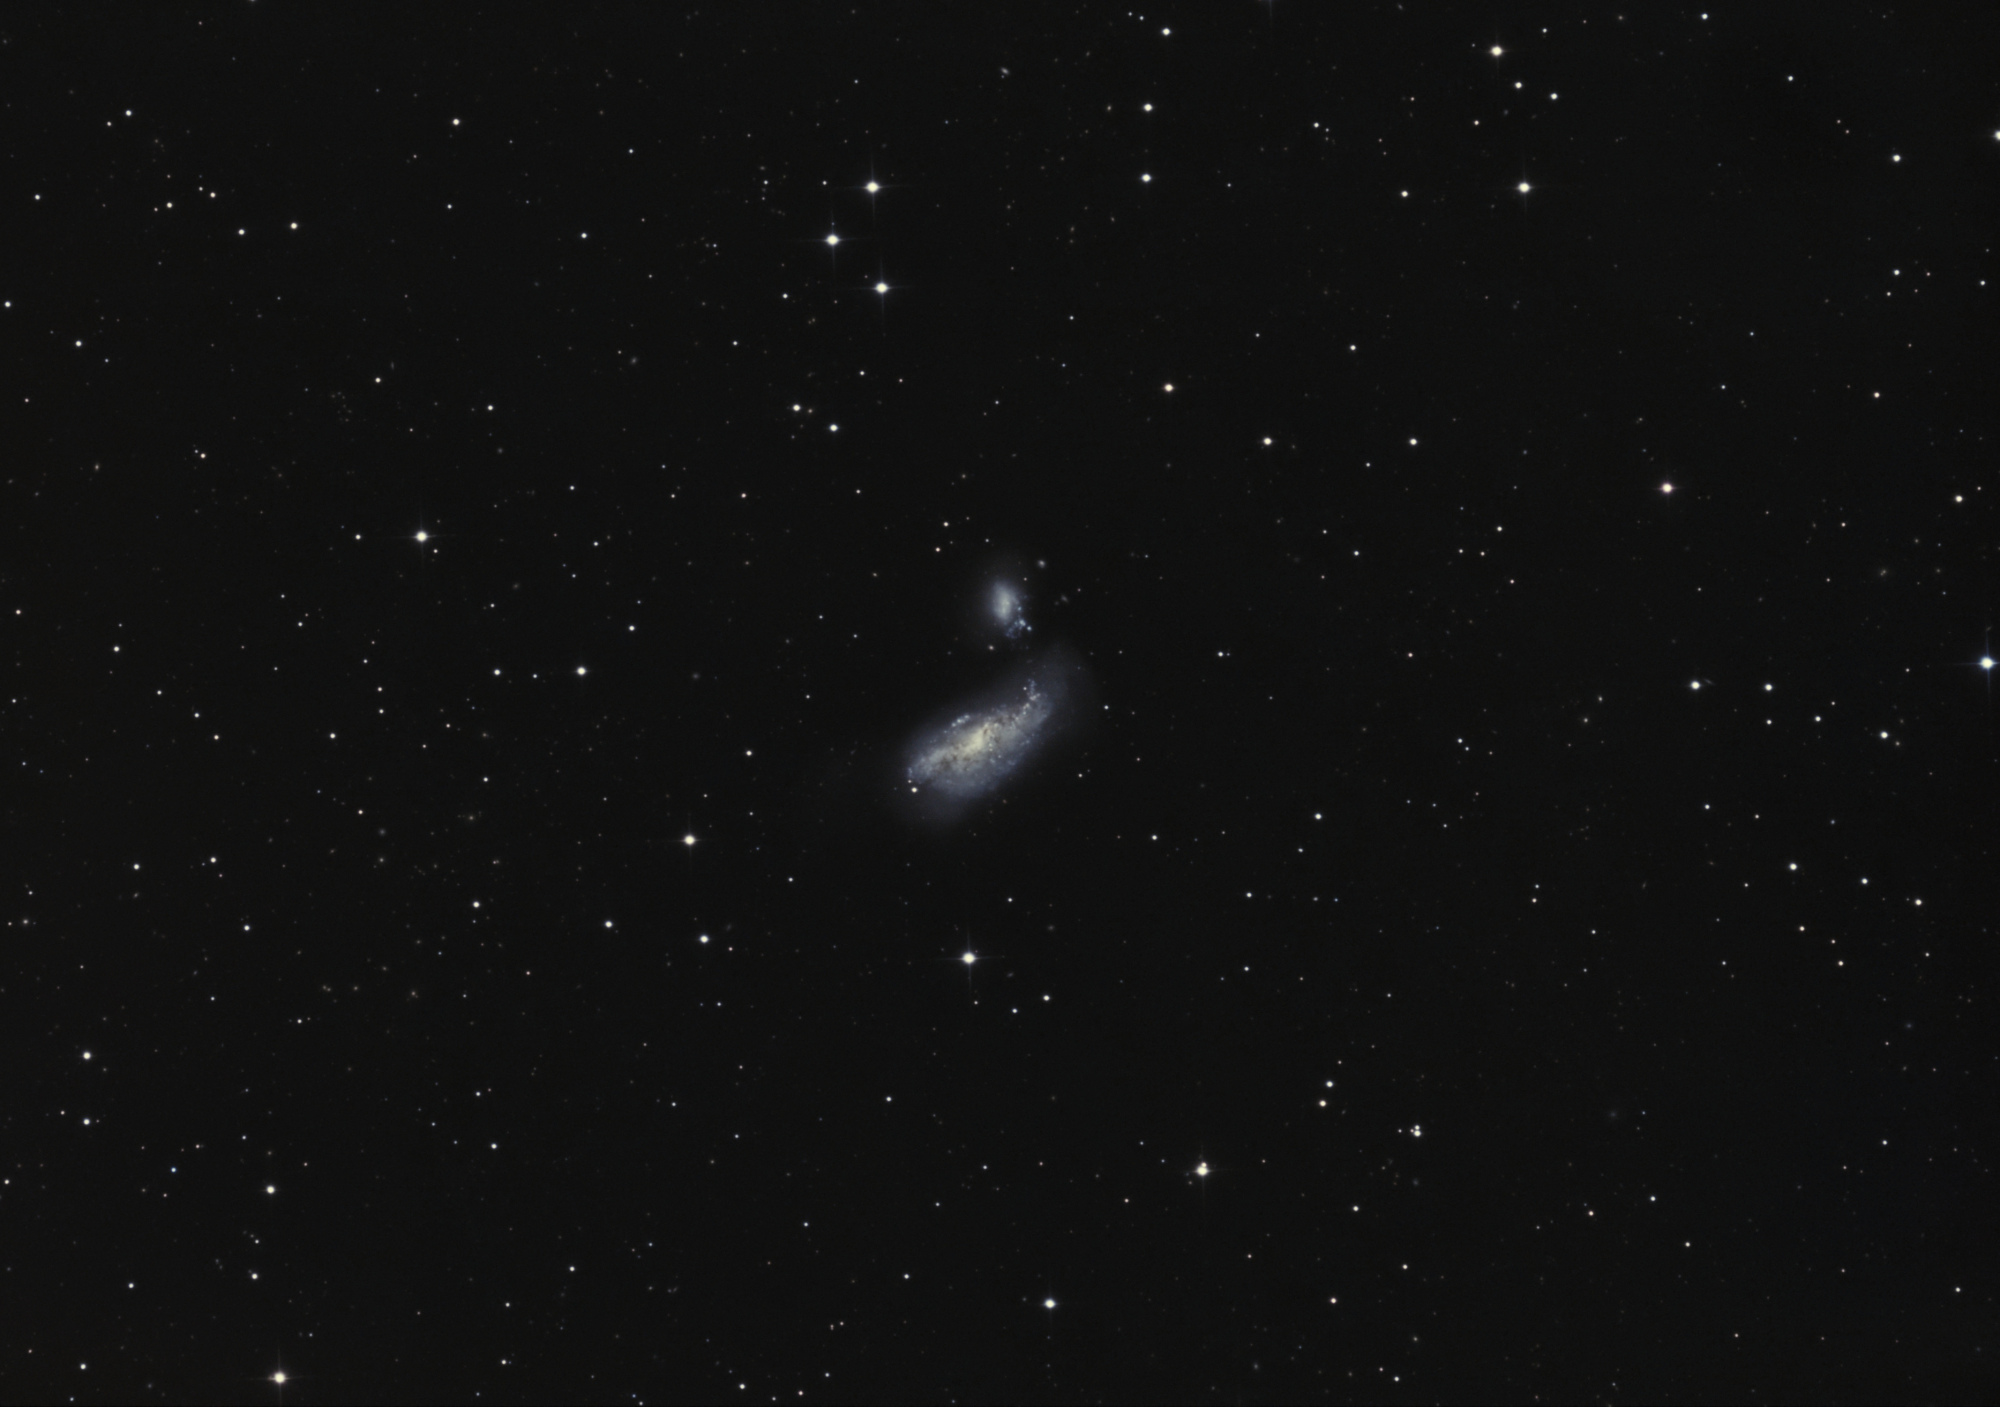 5e80afd88f87e_NGC4490pix.thumb.jpg.116b22fa620ca3dd0ebf23ac19024a5a.jpg